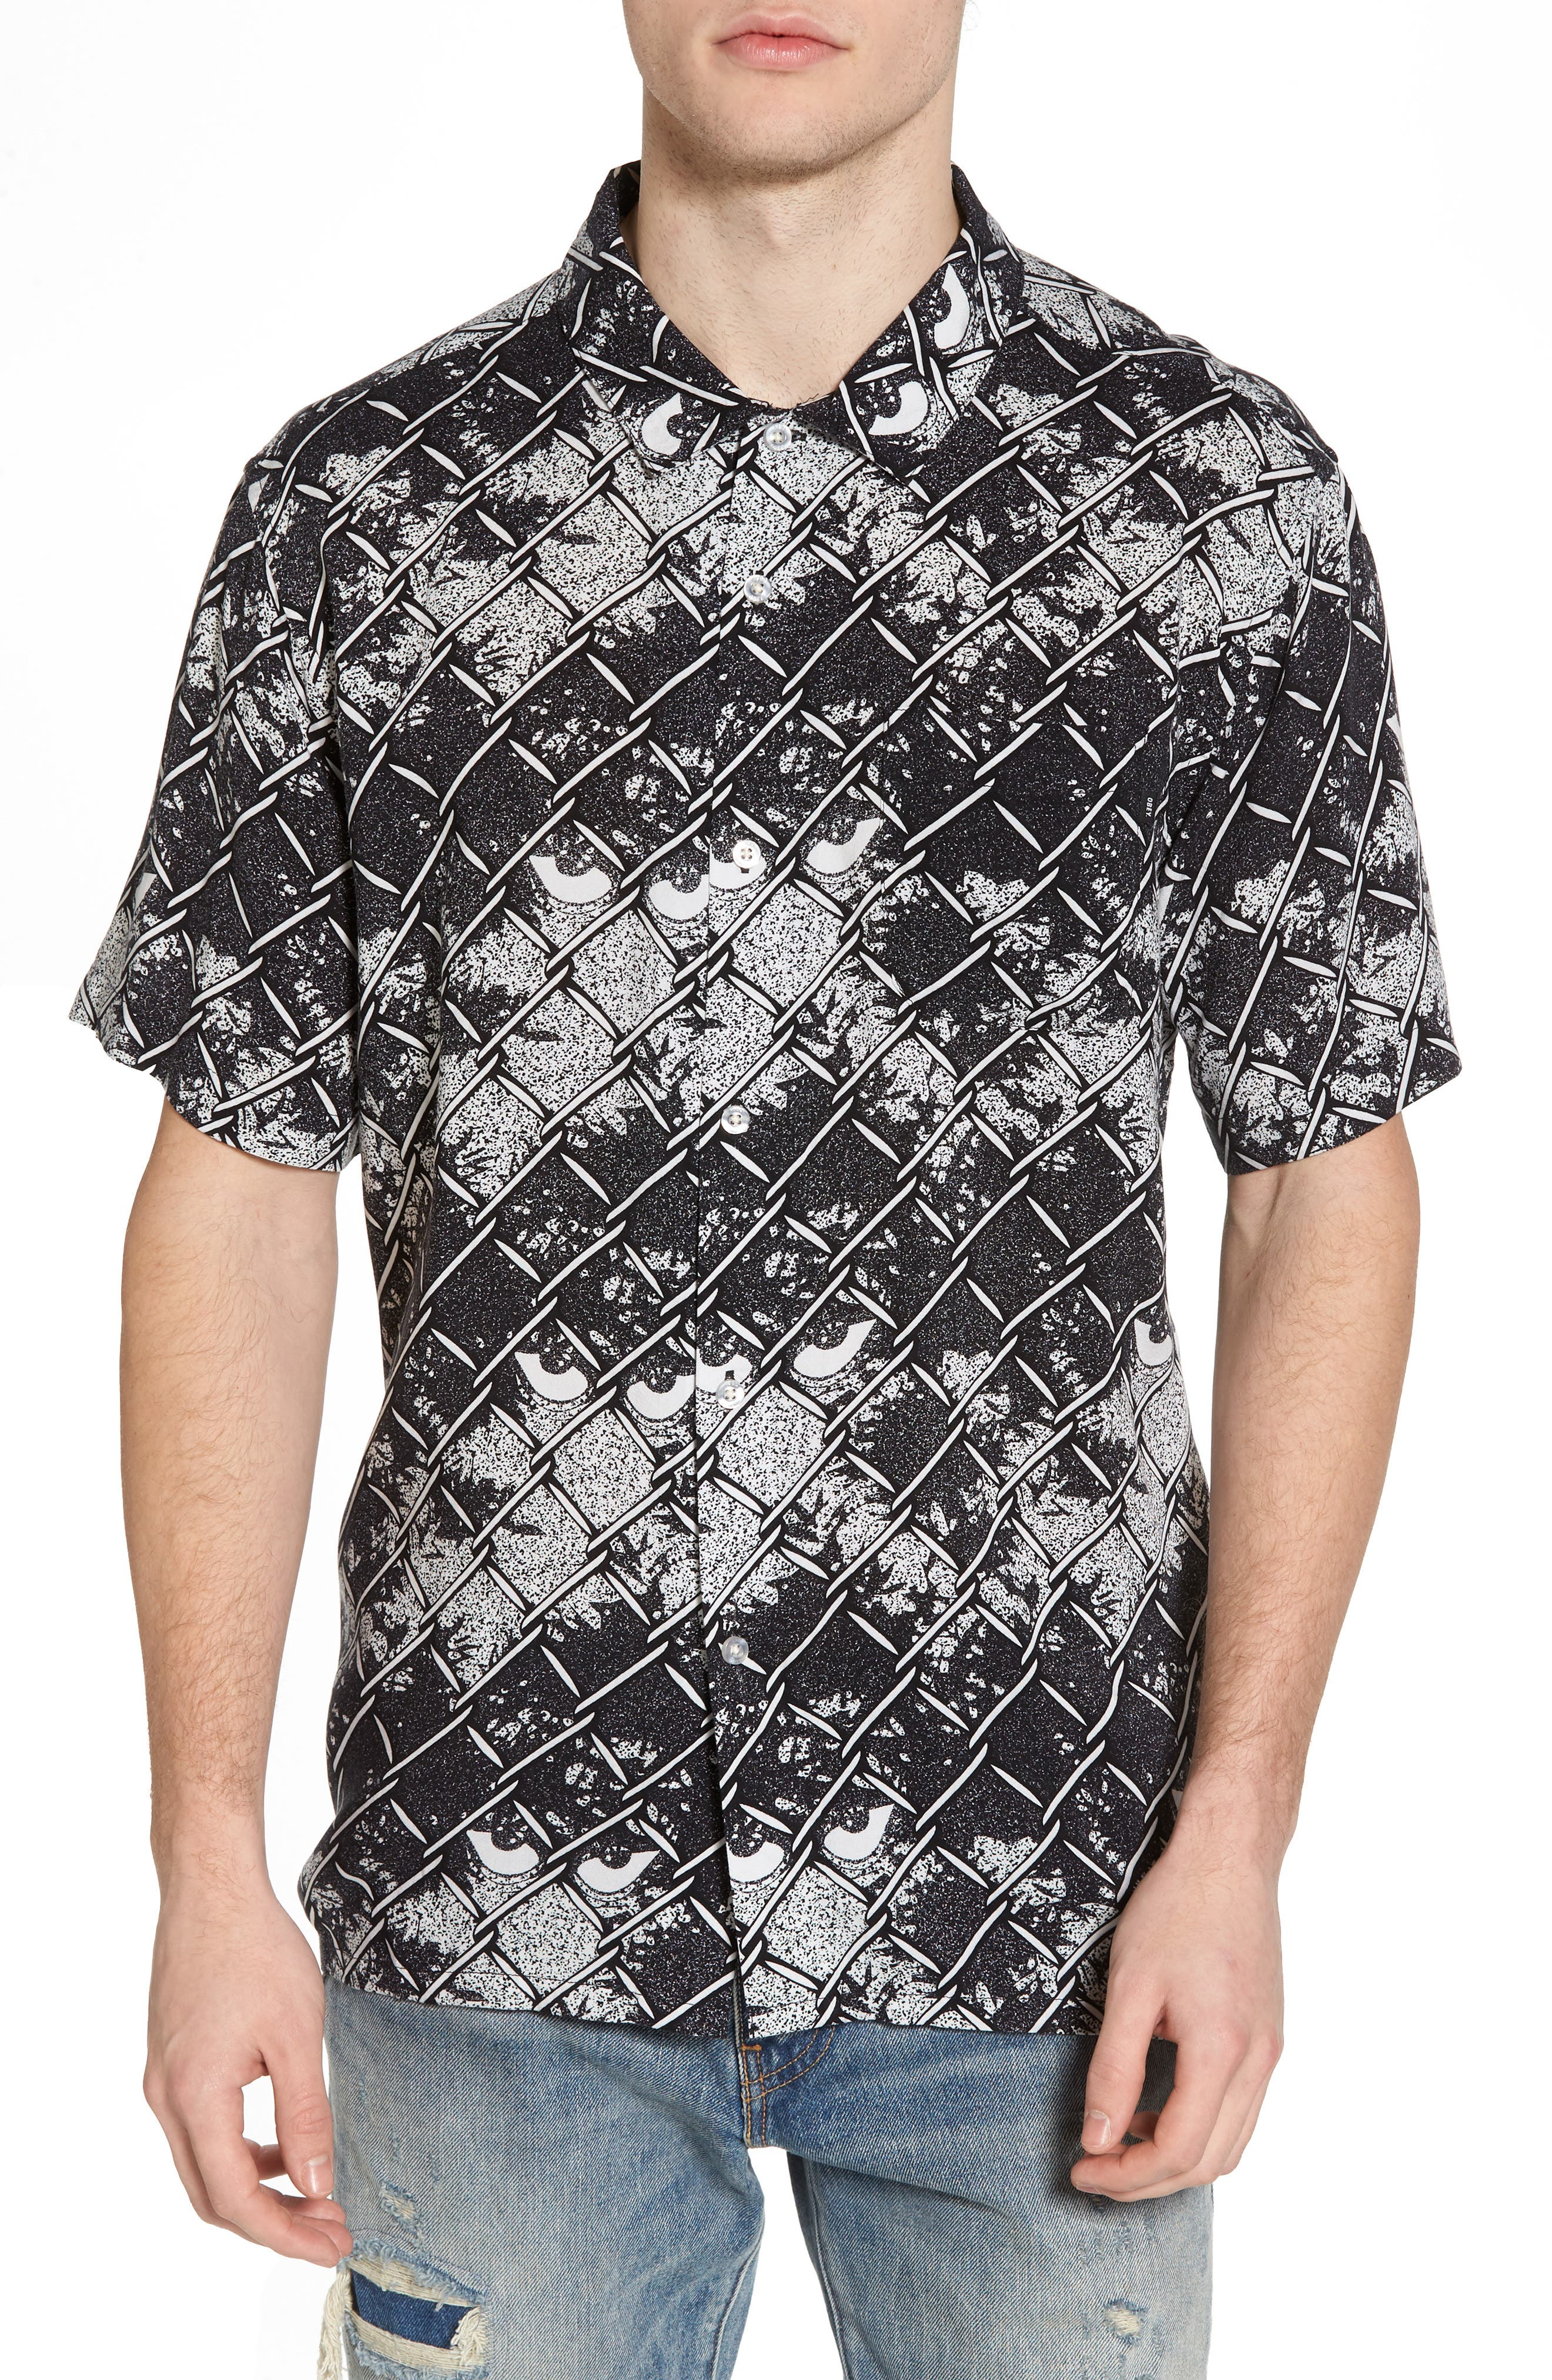 Alternate Image 1 Selected - Obey Gatekeeper Short Sleeve Shirt